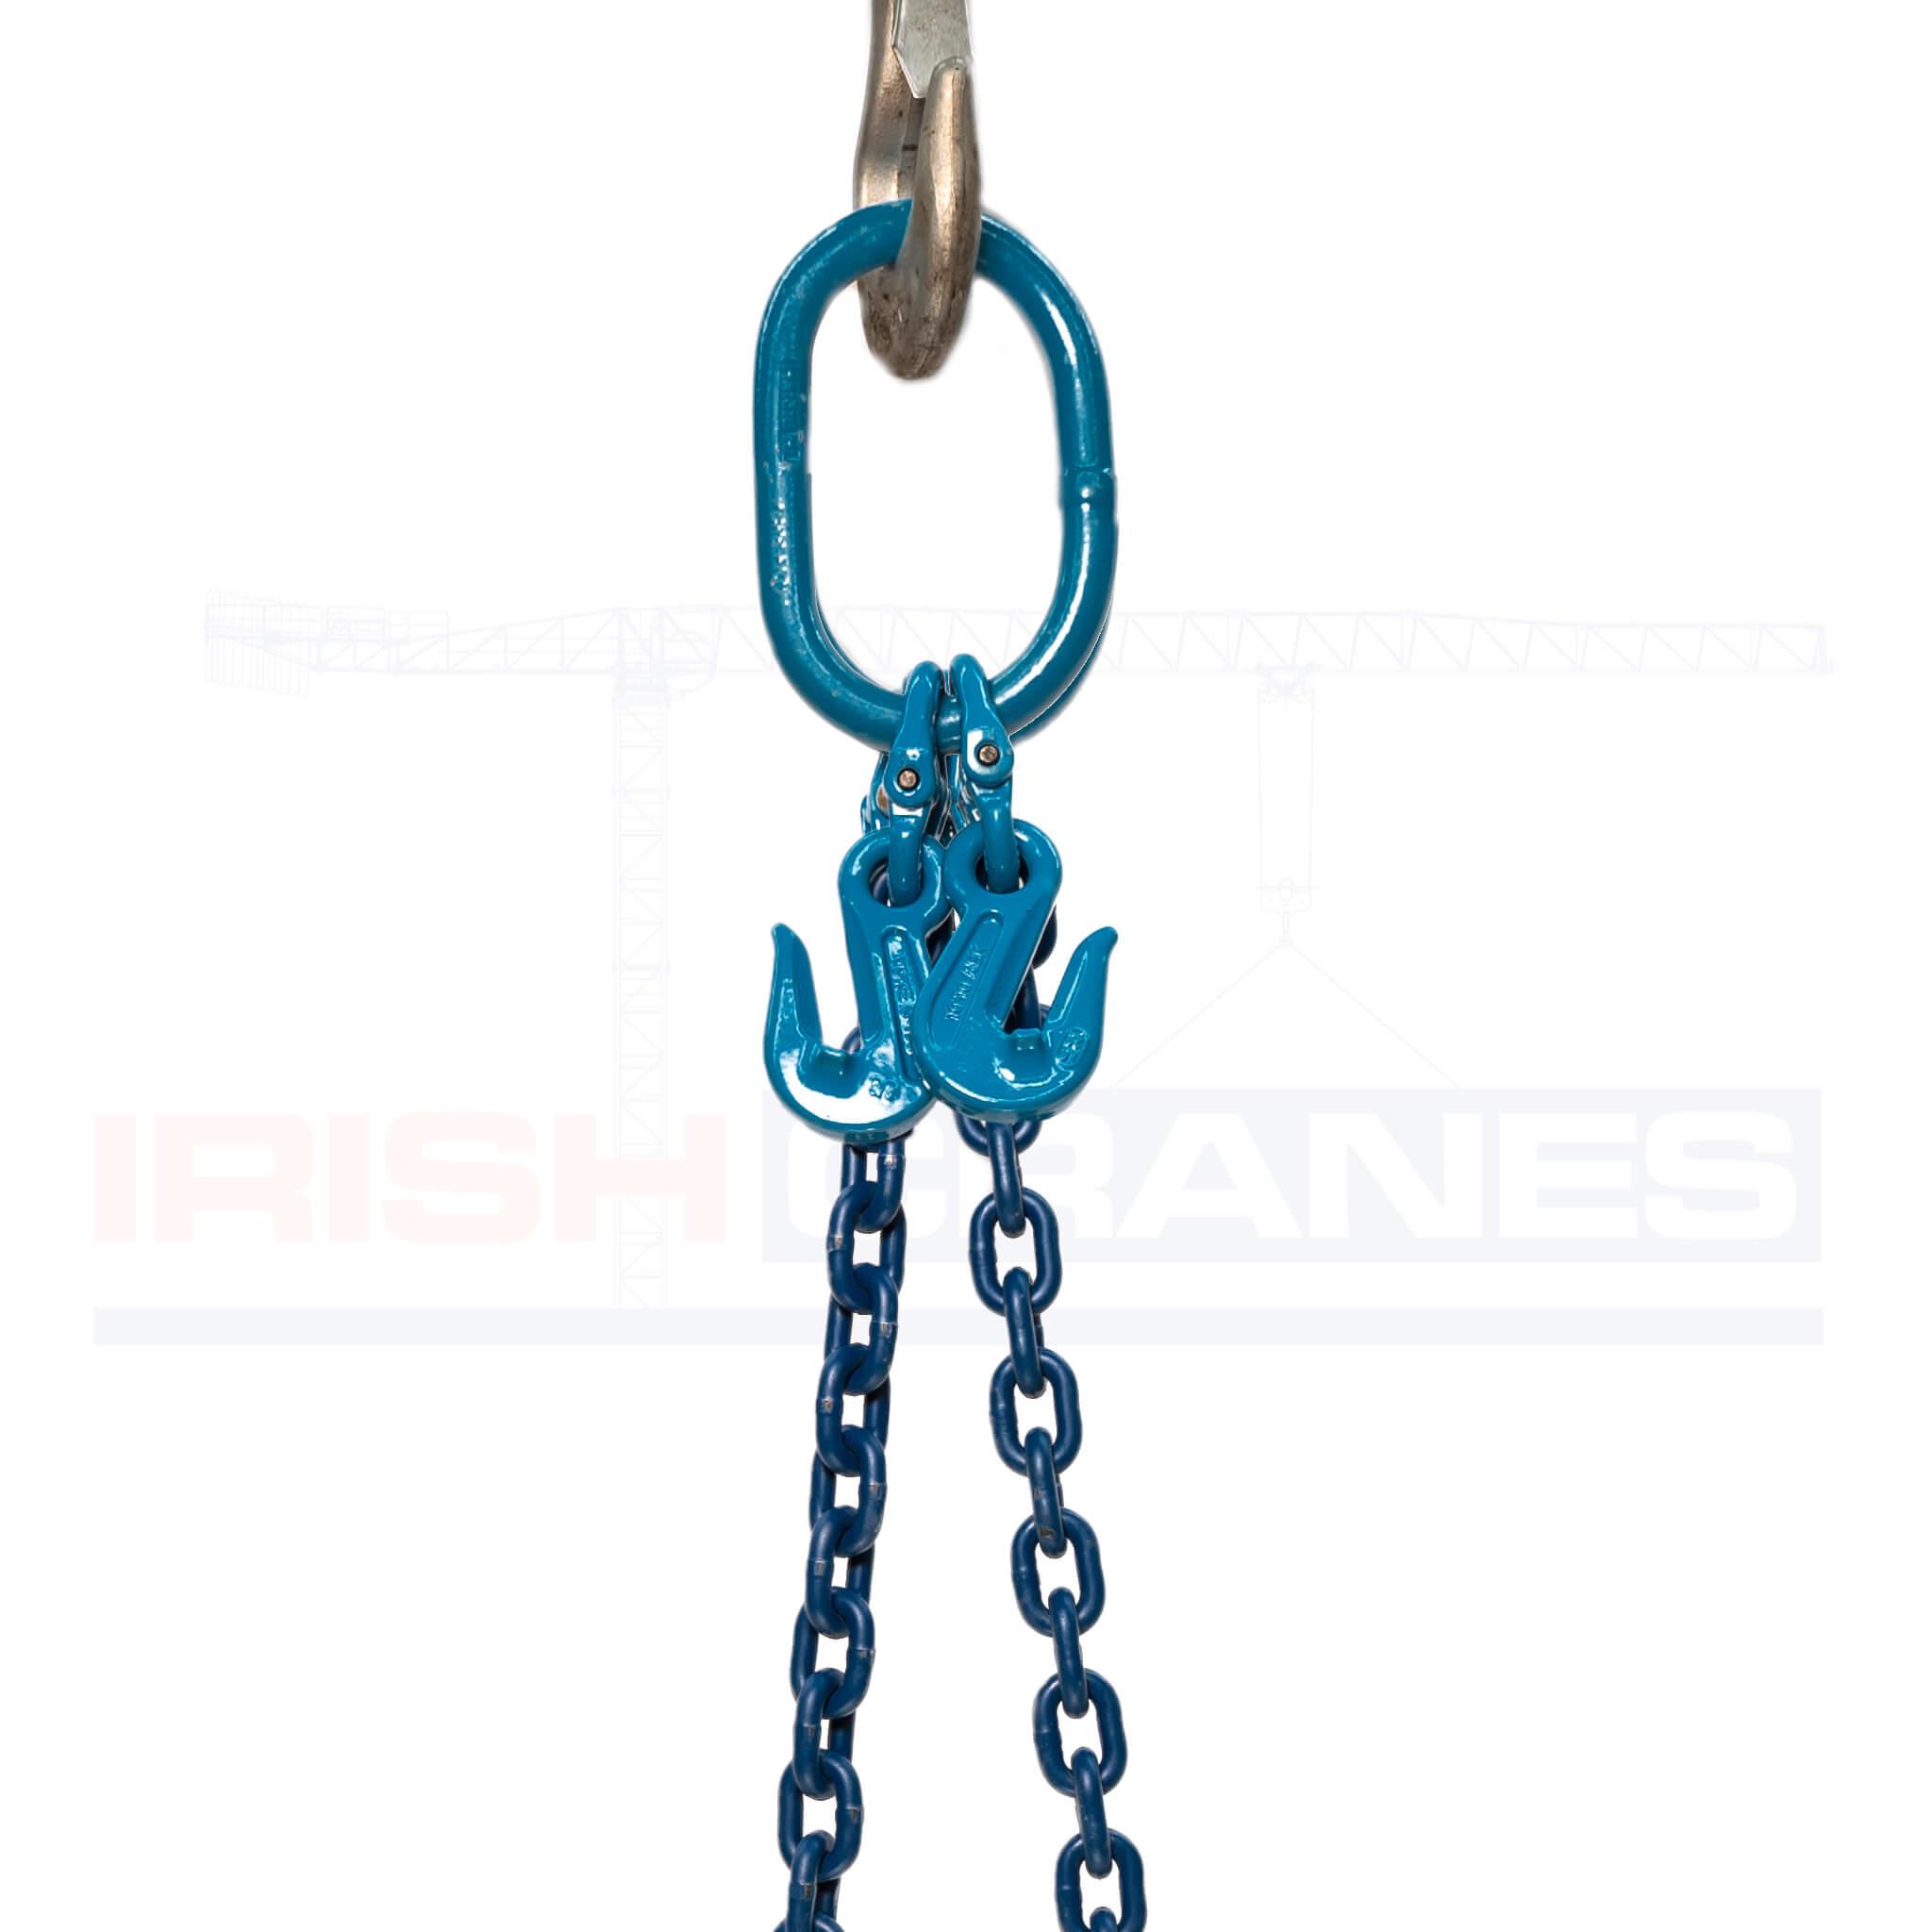 2 Leg Chain – Lifting Chain Sling Shortener